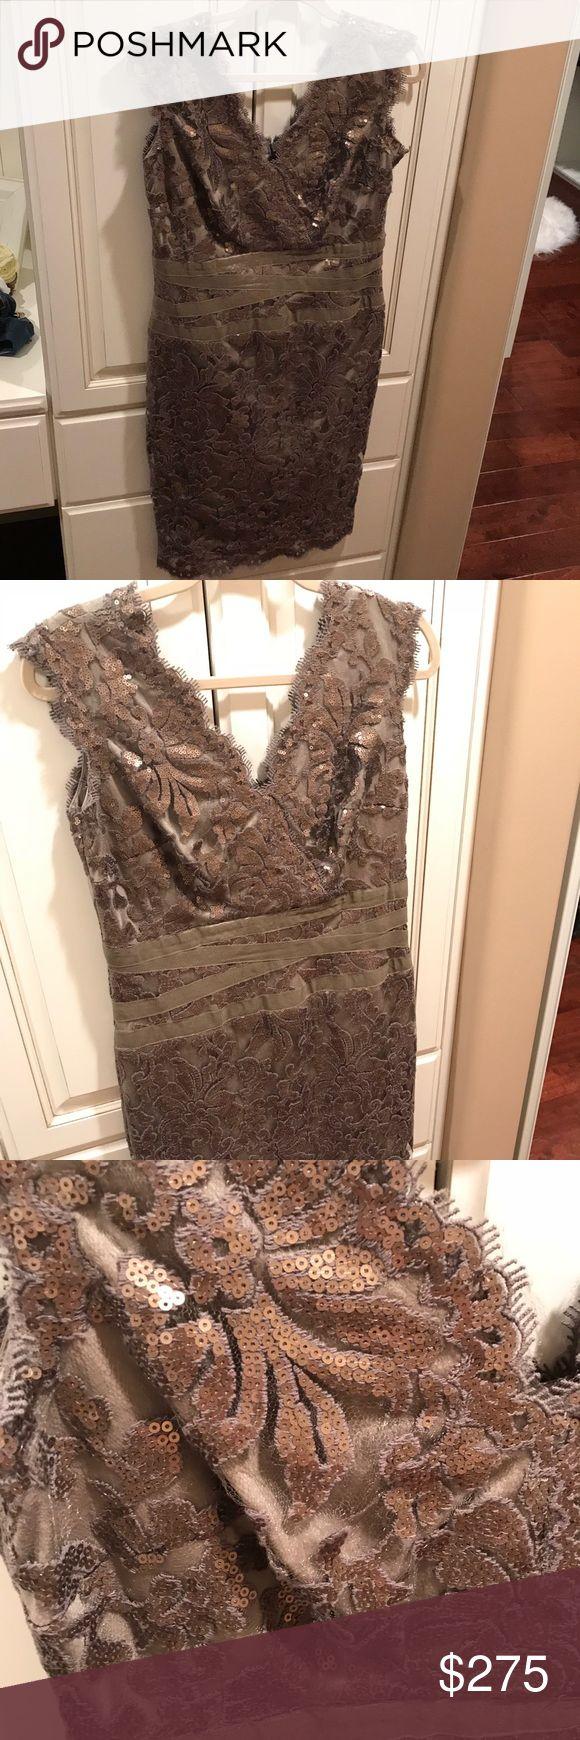 Tadashi Shohi Sequin Sheath Dress Tadashi Shoji dress - worn twice. Beautiful bronze/green golden shiny color, called smoke pearl. Similar dresses available at Nordstrom's and Bloomingdales. Tadashi Shoji Dresses